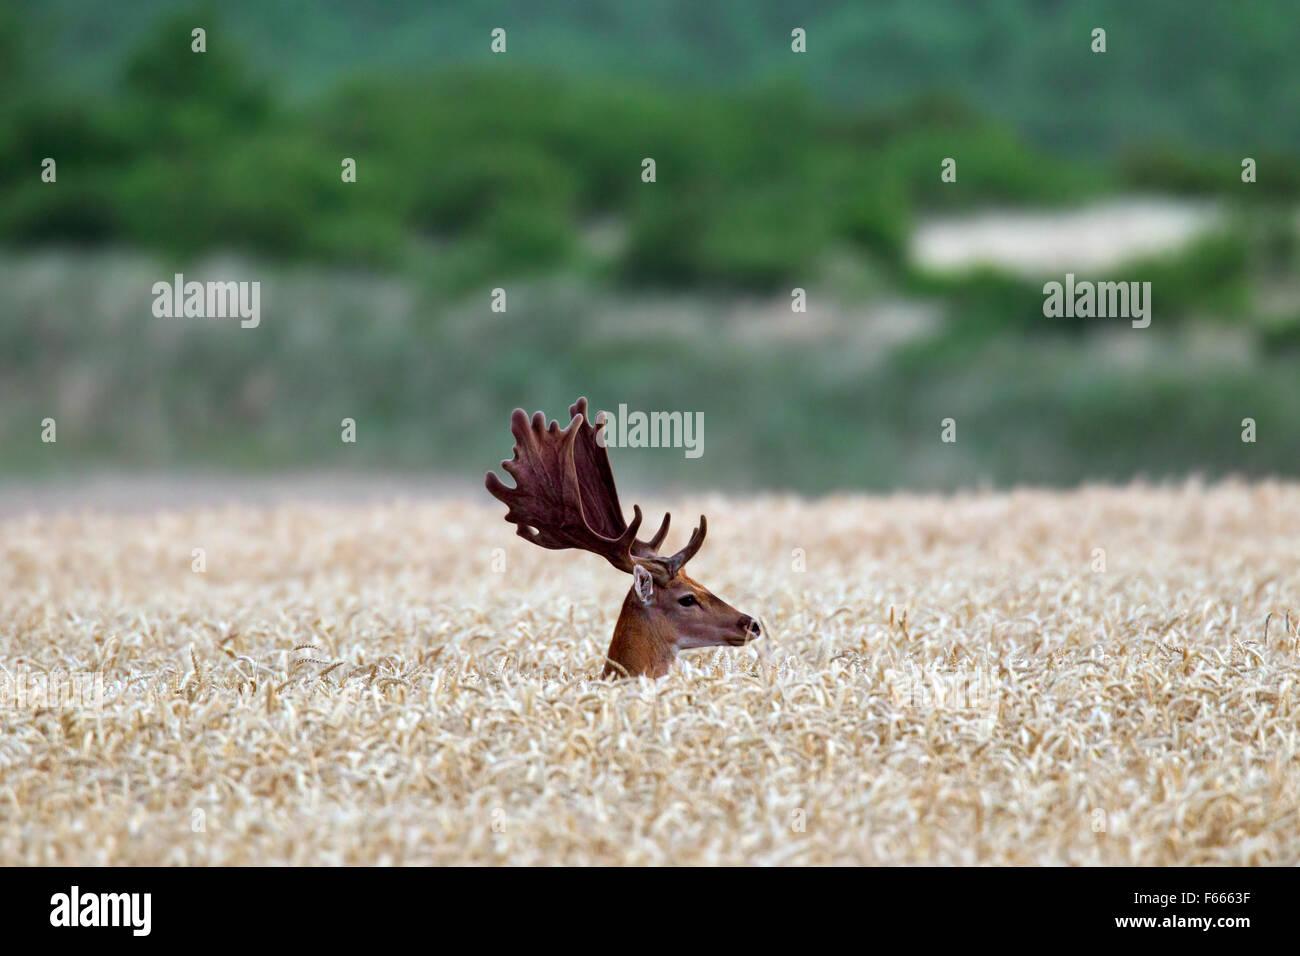 Fallow deer (Dama dama) buck with antlers covered in velvet in cornfield in summer Stock Photo